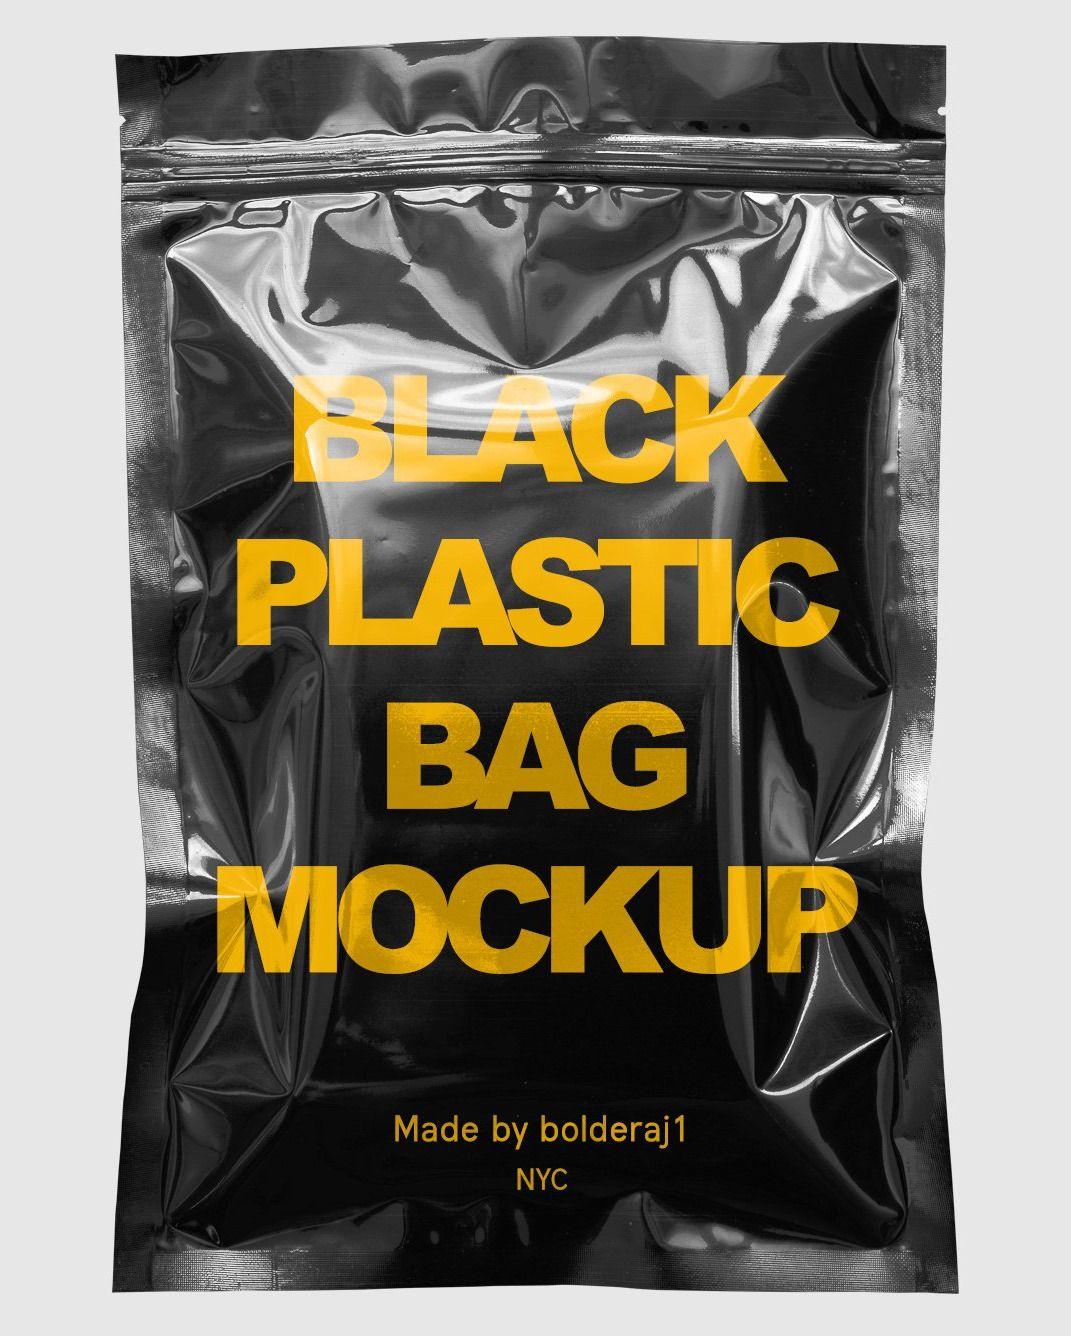 Download Black Plastic Bag Mockup Plastic Bag Design Plastic Bag Packaging Bag Mockup